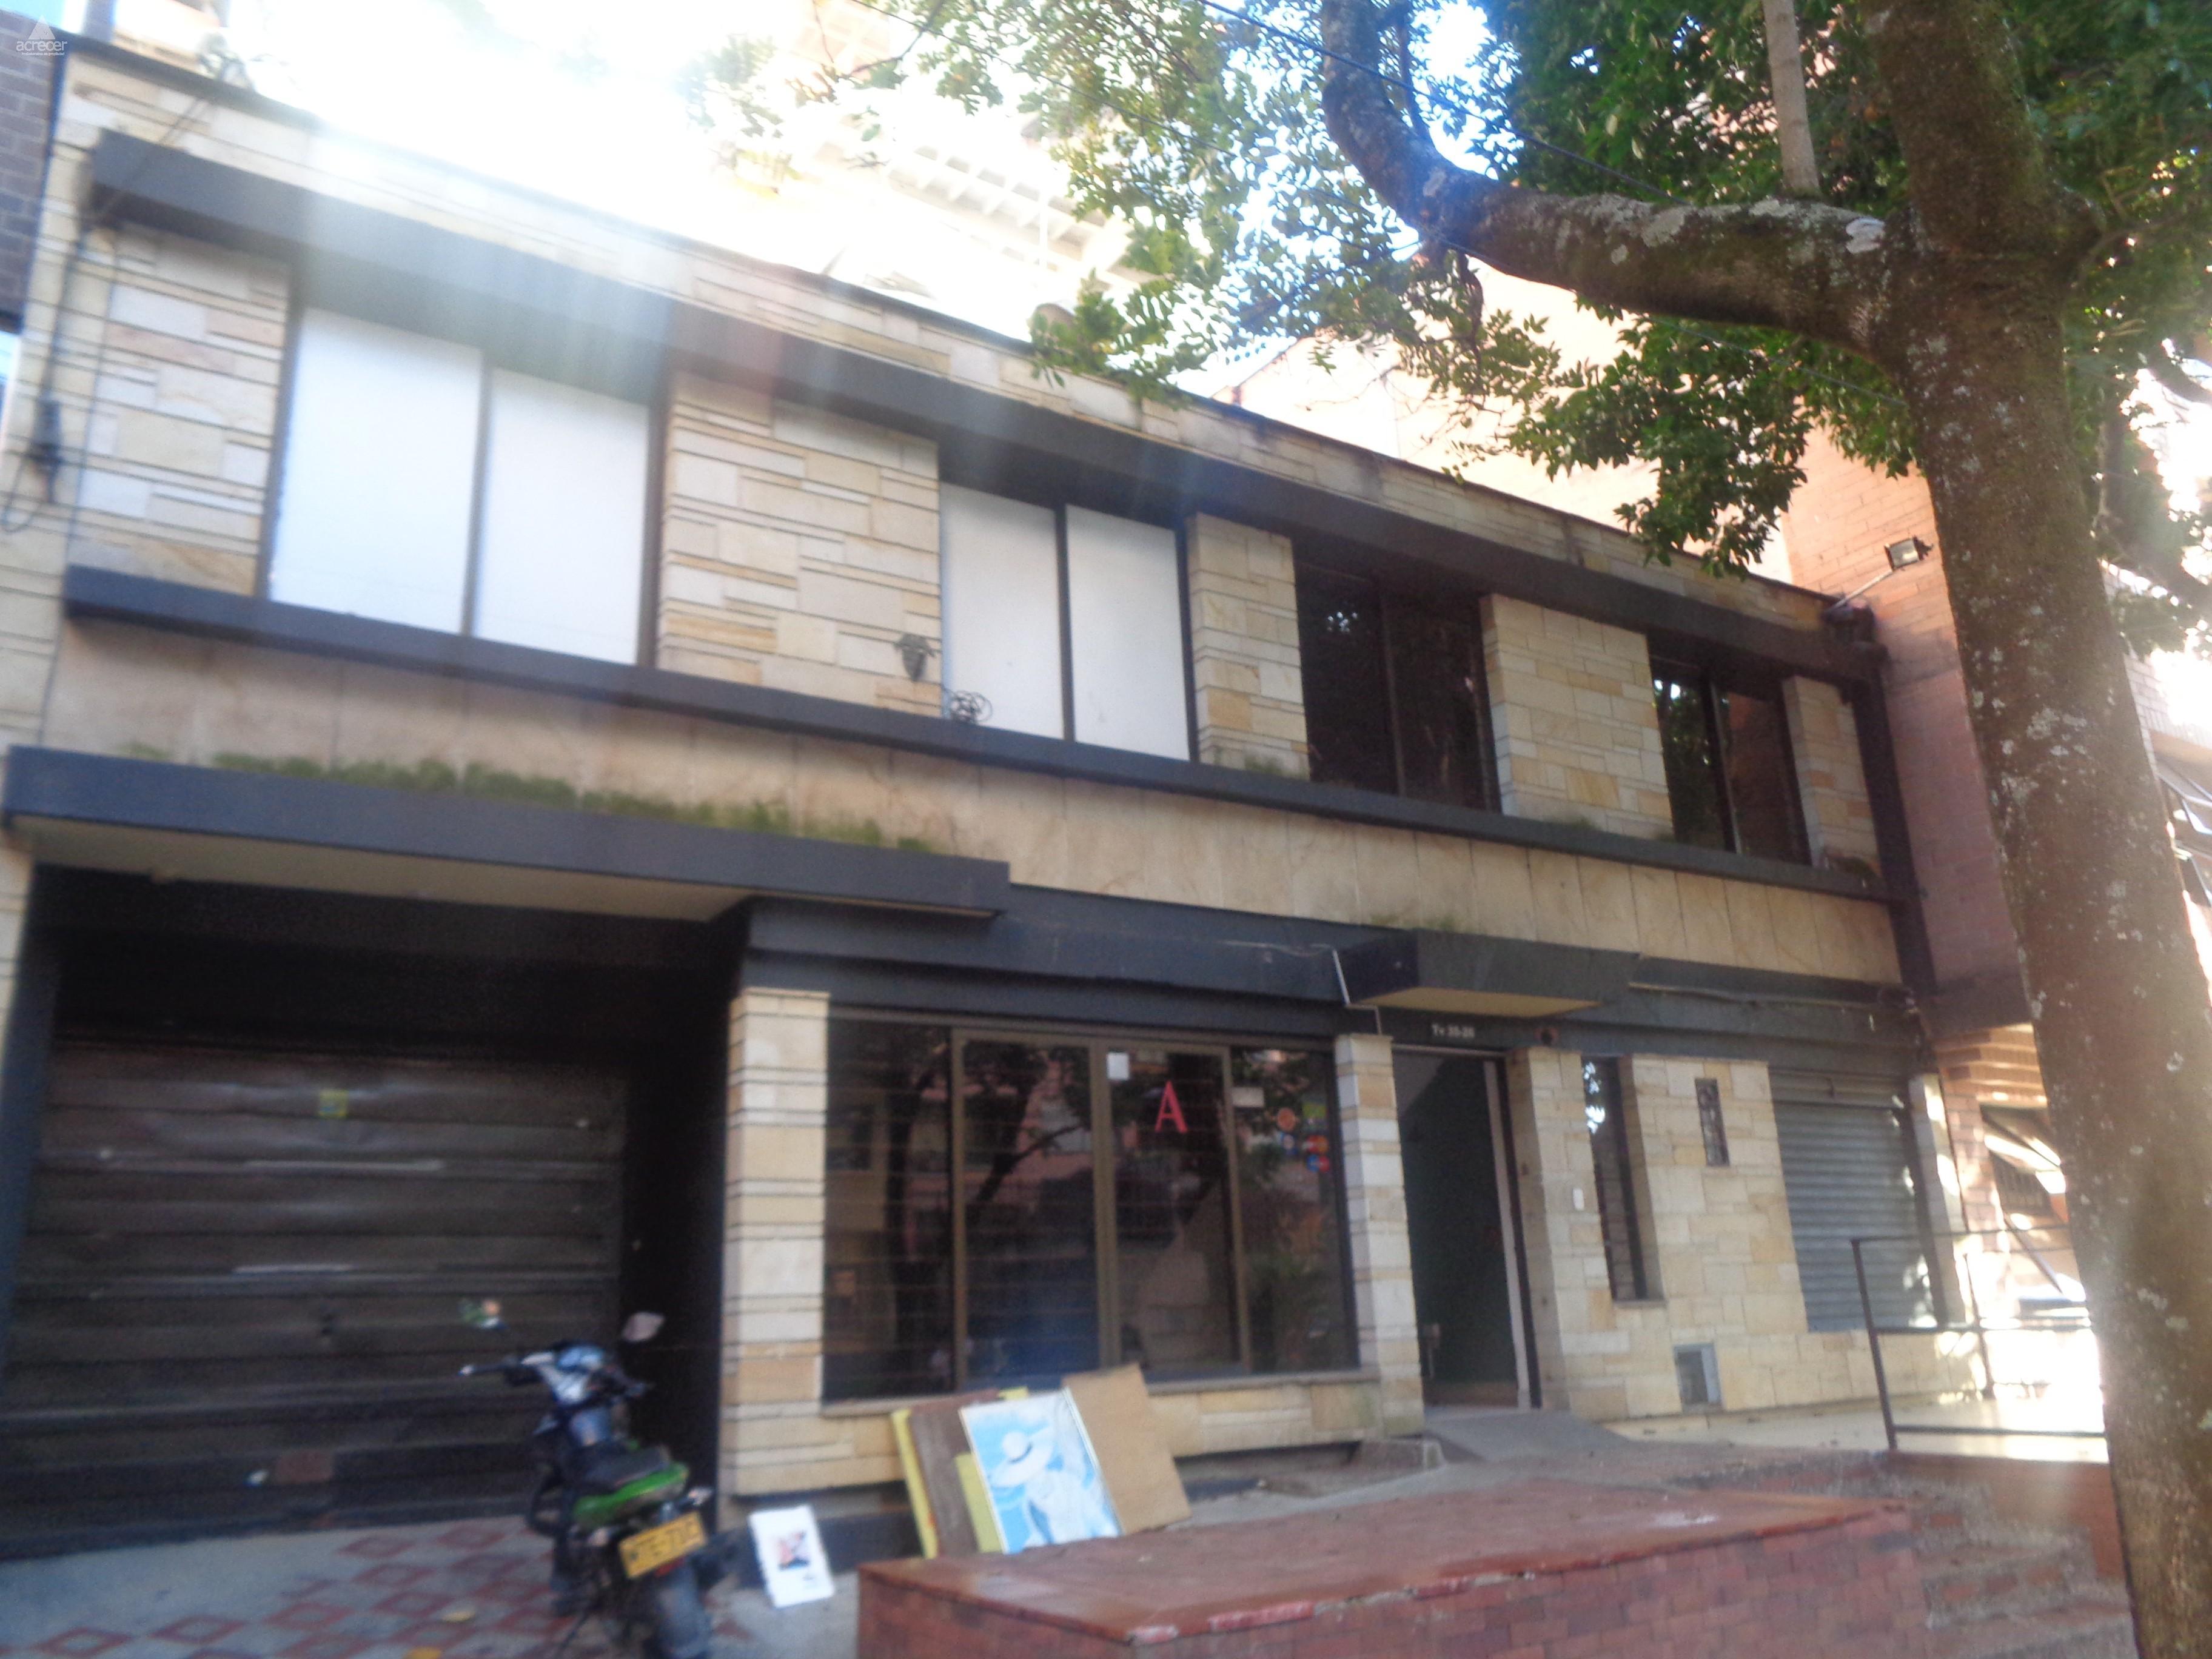 Casa en arriendo en laureles goplaceit for 5 mobilia place gnangara